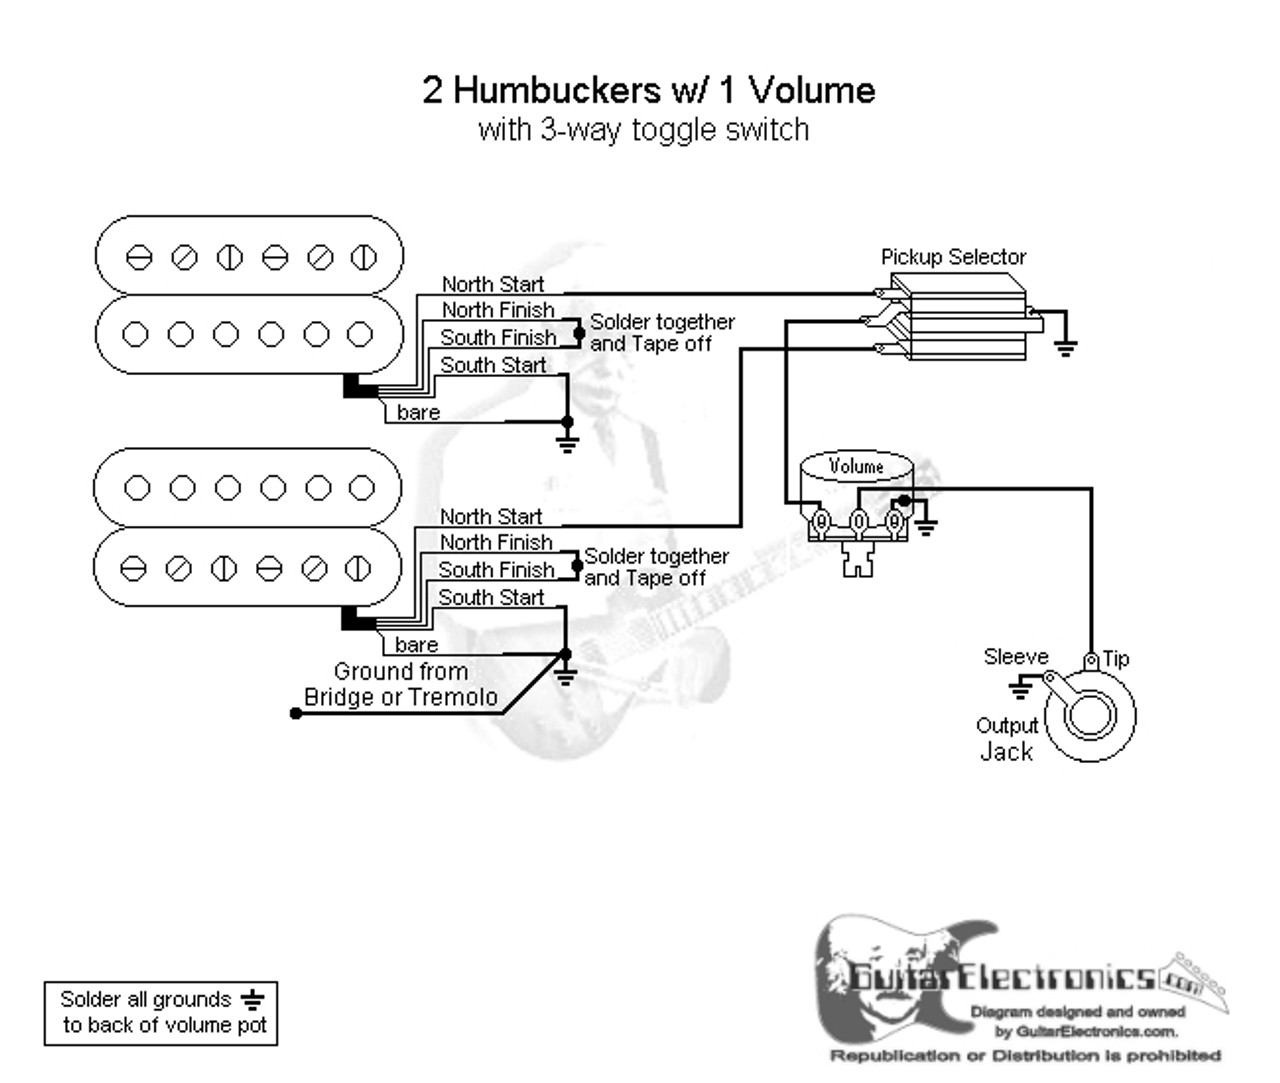 hight resolution of humbucker single 1 volume 3 way switch wiring diagram humbuckers2 humbuckers 3 way toggle switch 1